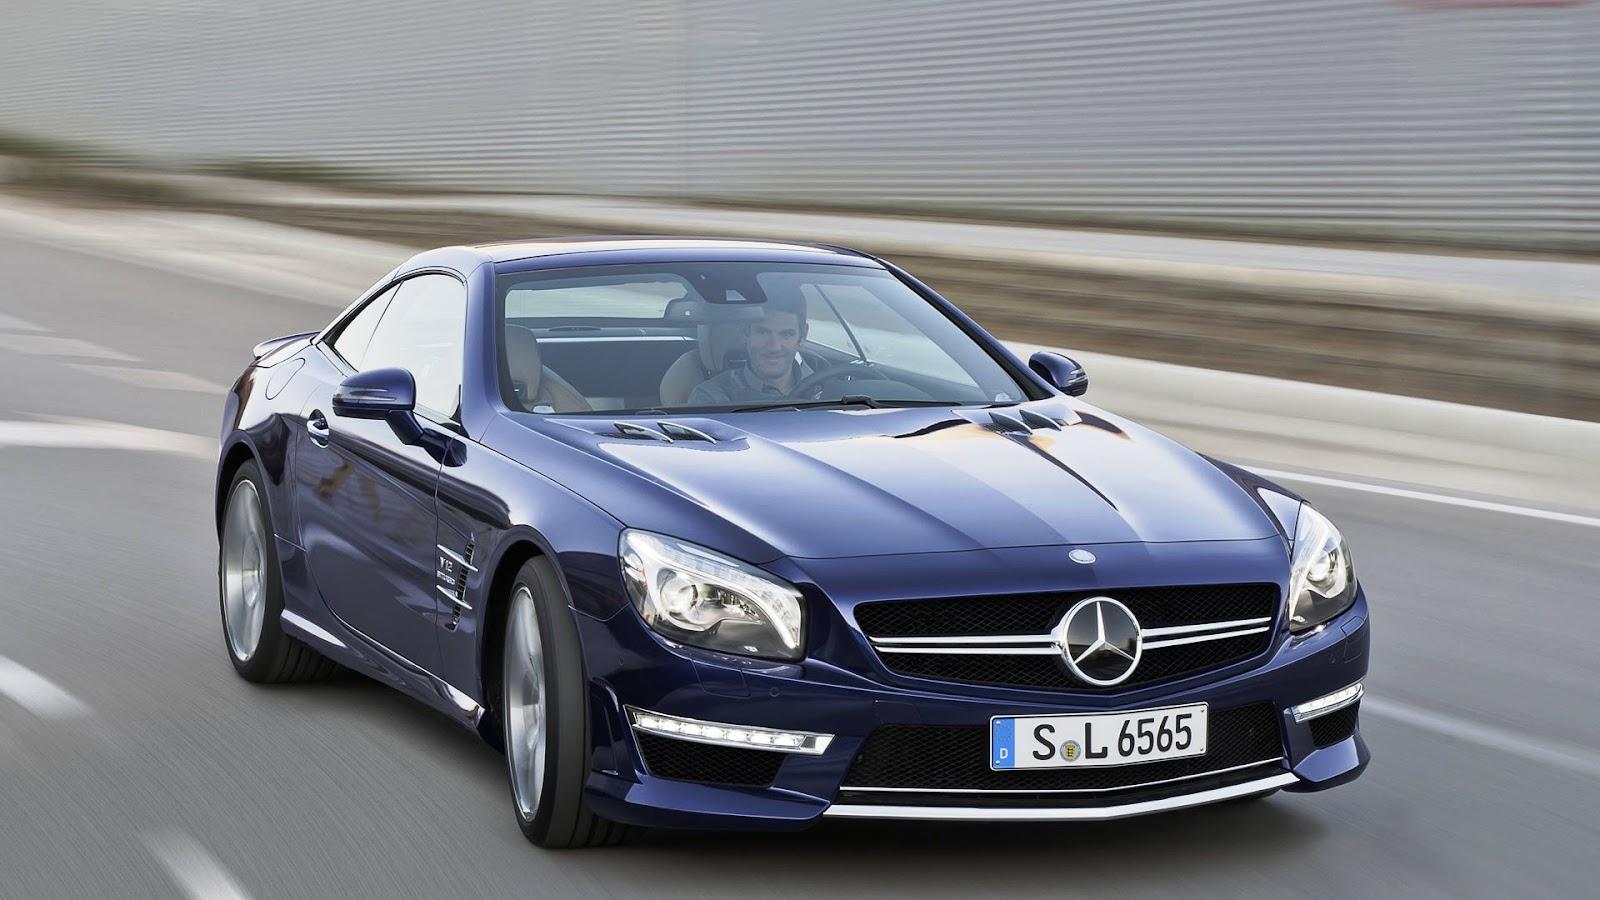 2012 mercedes benz sl65 amg free full hd car wallpaper for Best mercedes benz model